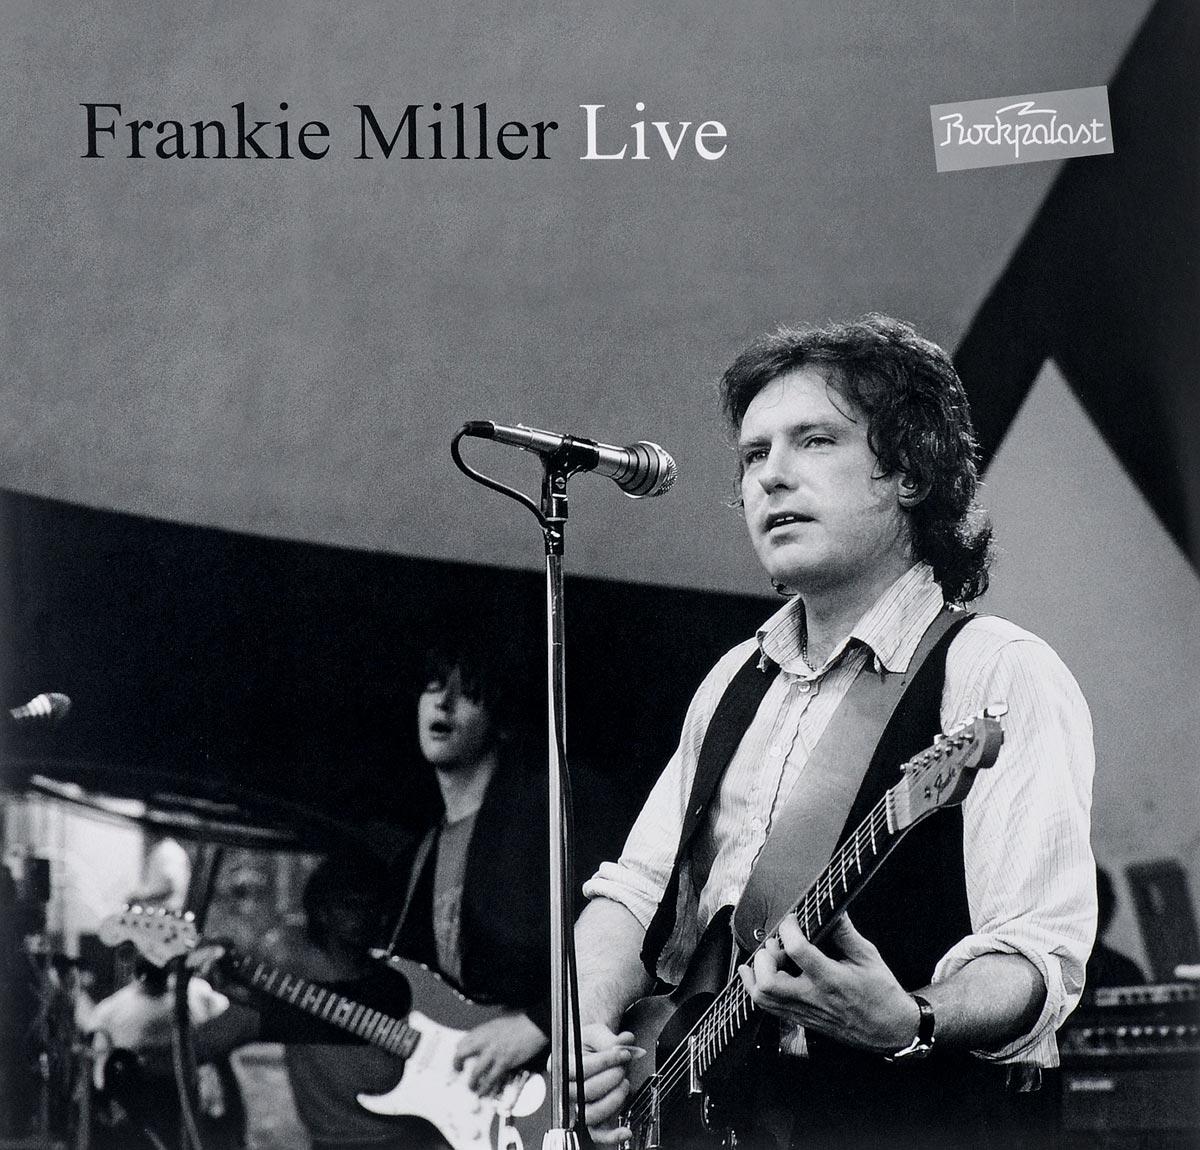 Фрэнки Миллер Frankie Miller. Live (2 LP) в пукемова olaf breuning tony matelli john miller олаф брюнинг тони мателли джон миллер